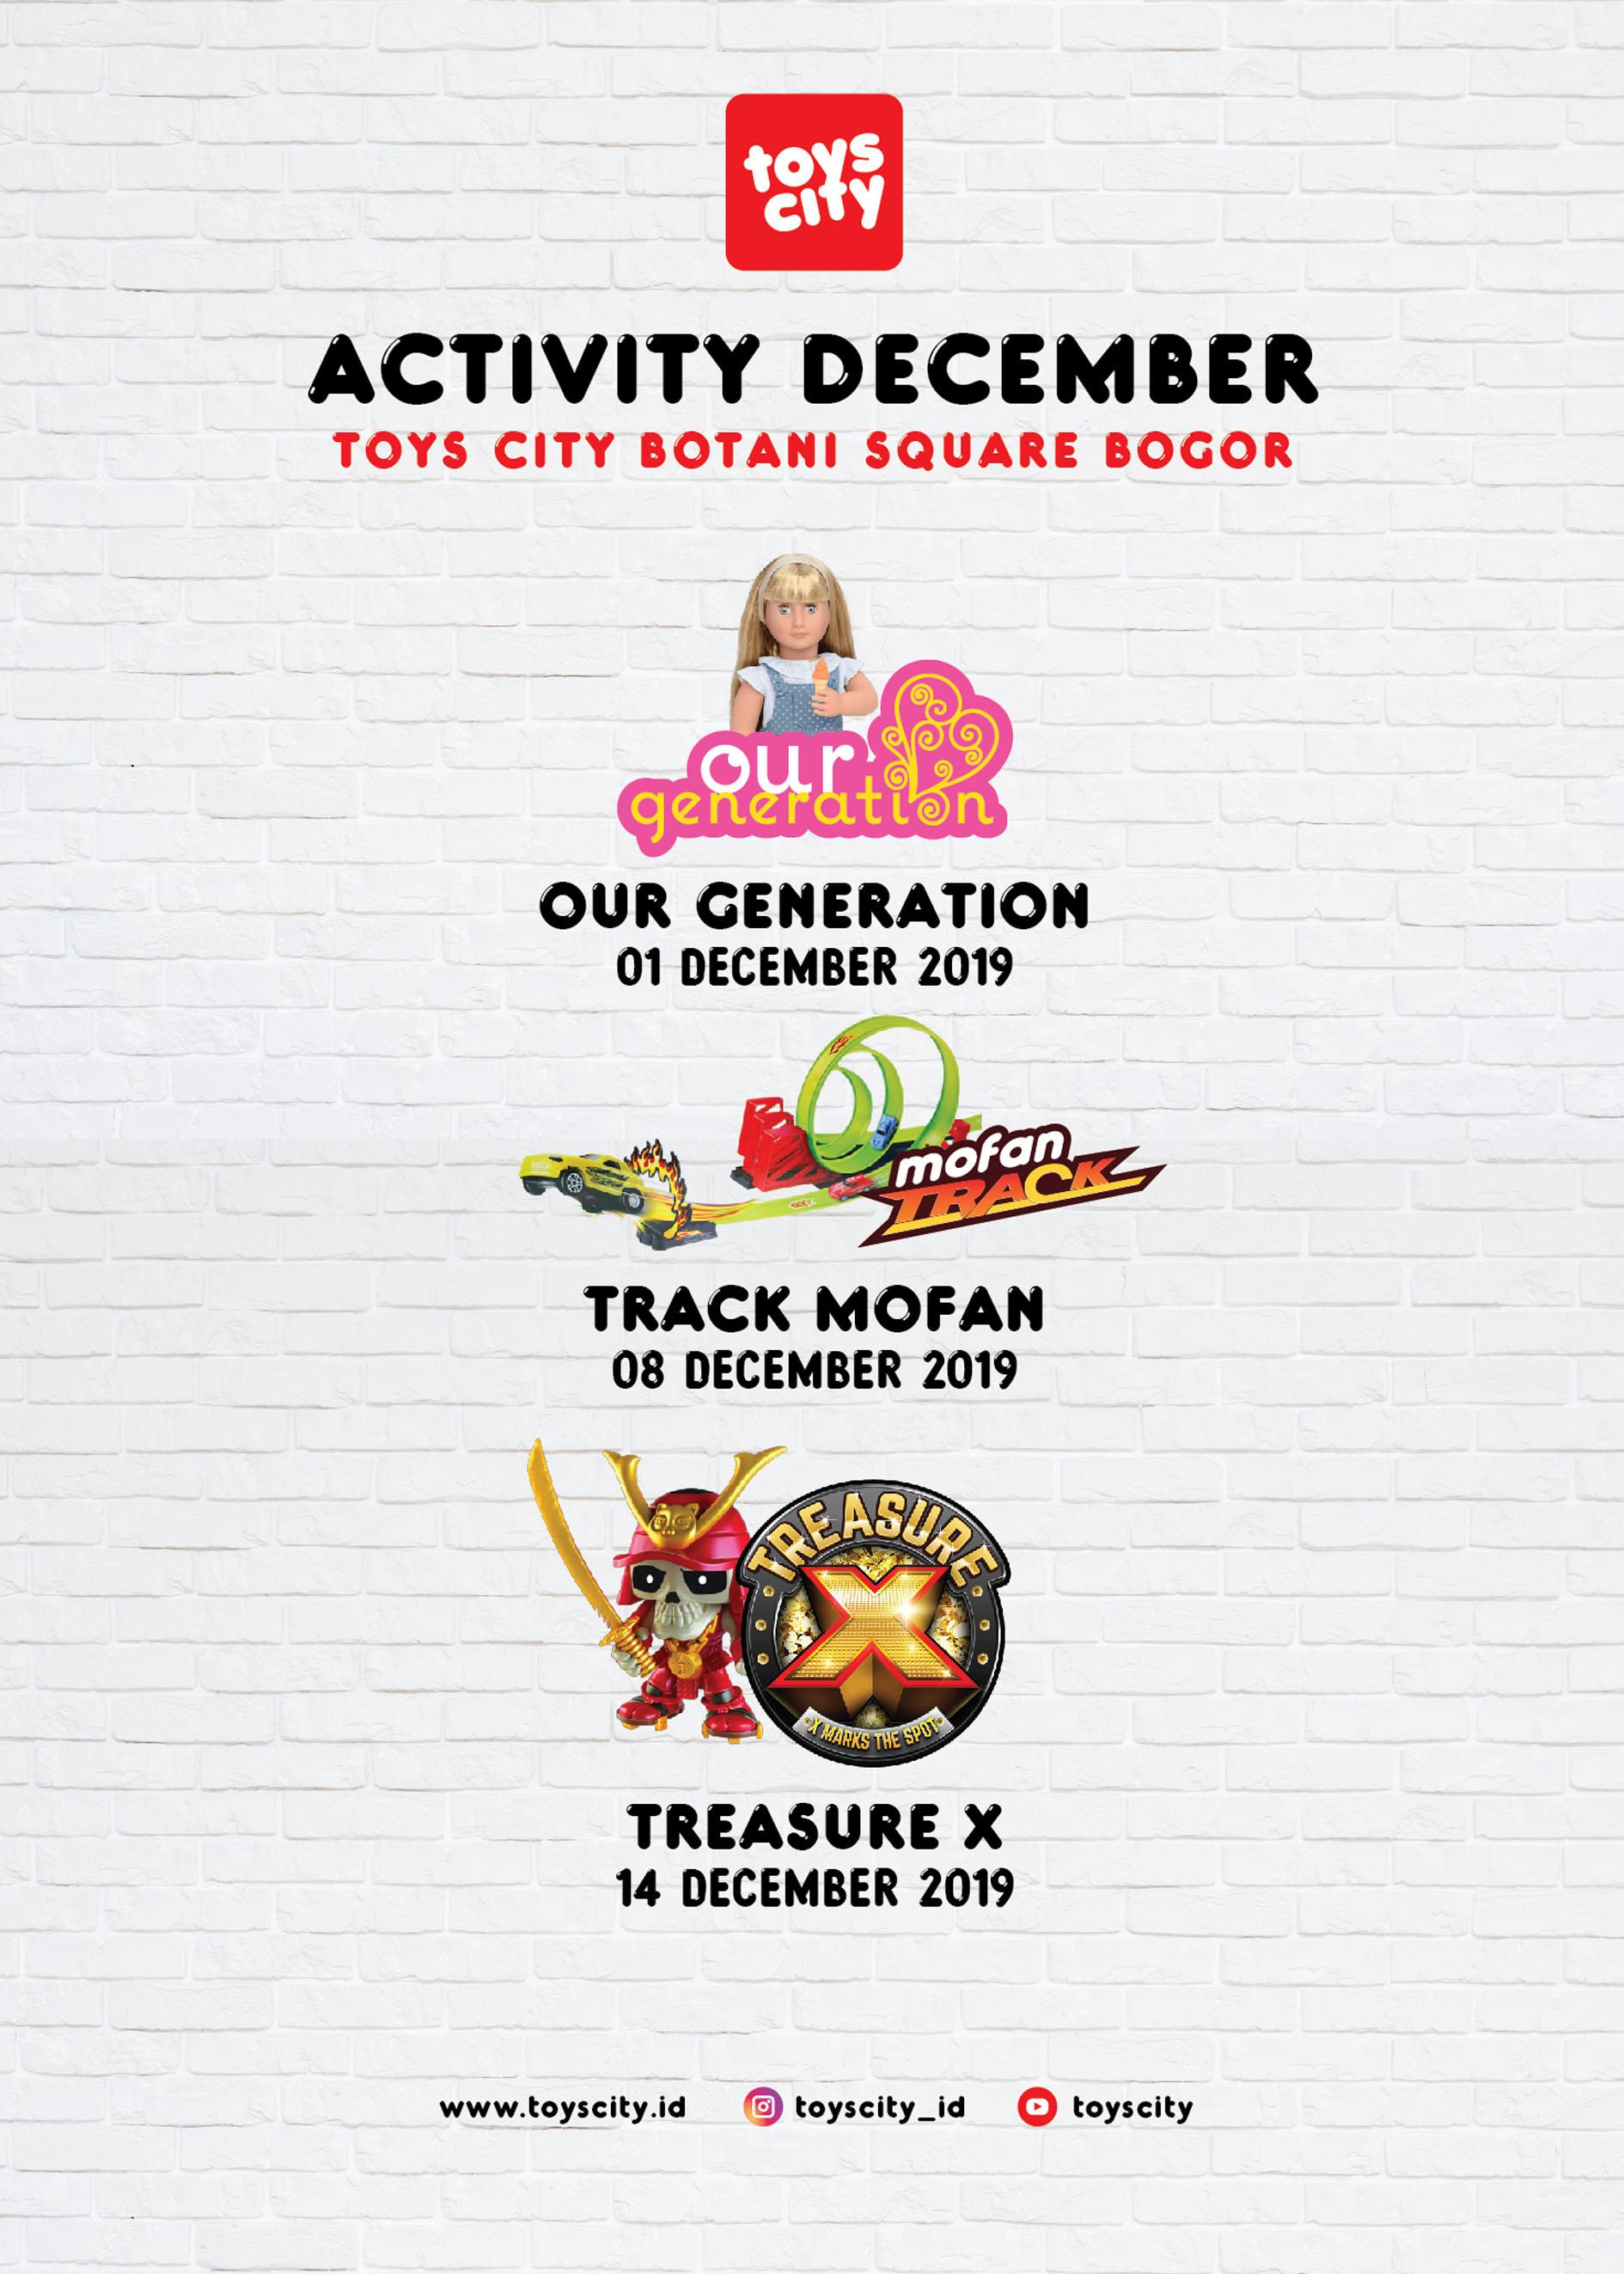 Tosycity Botani Square Bogor Mall December 2019 Activity